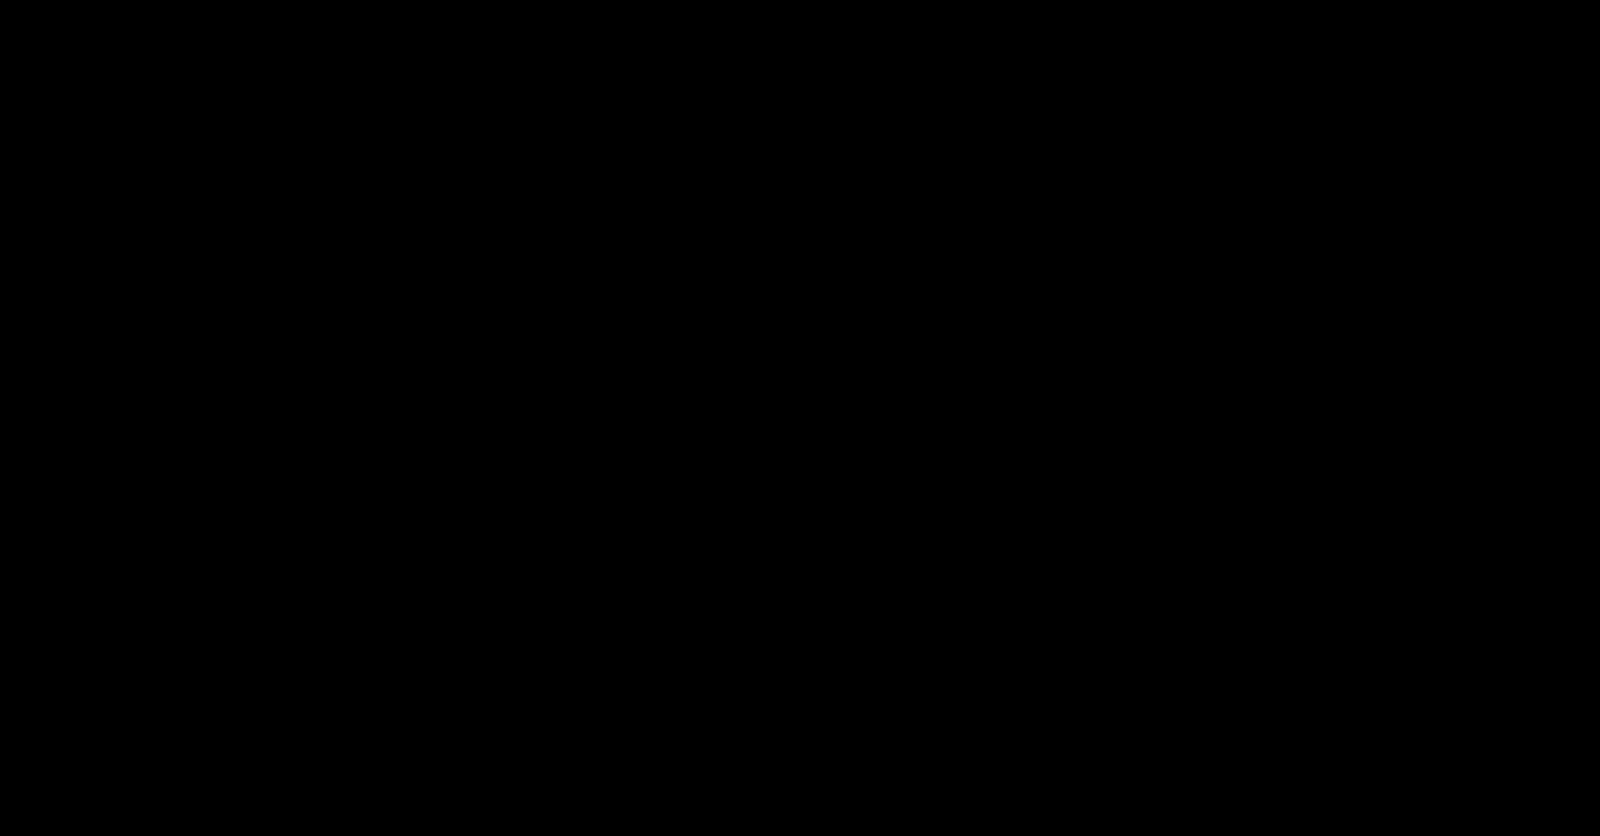 Drawn batman transparent background Clip com background Batman kid